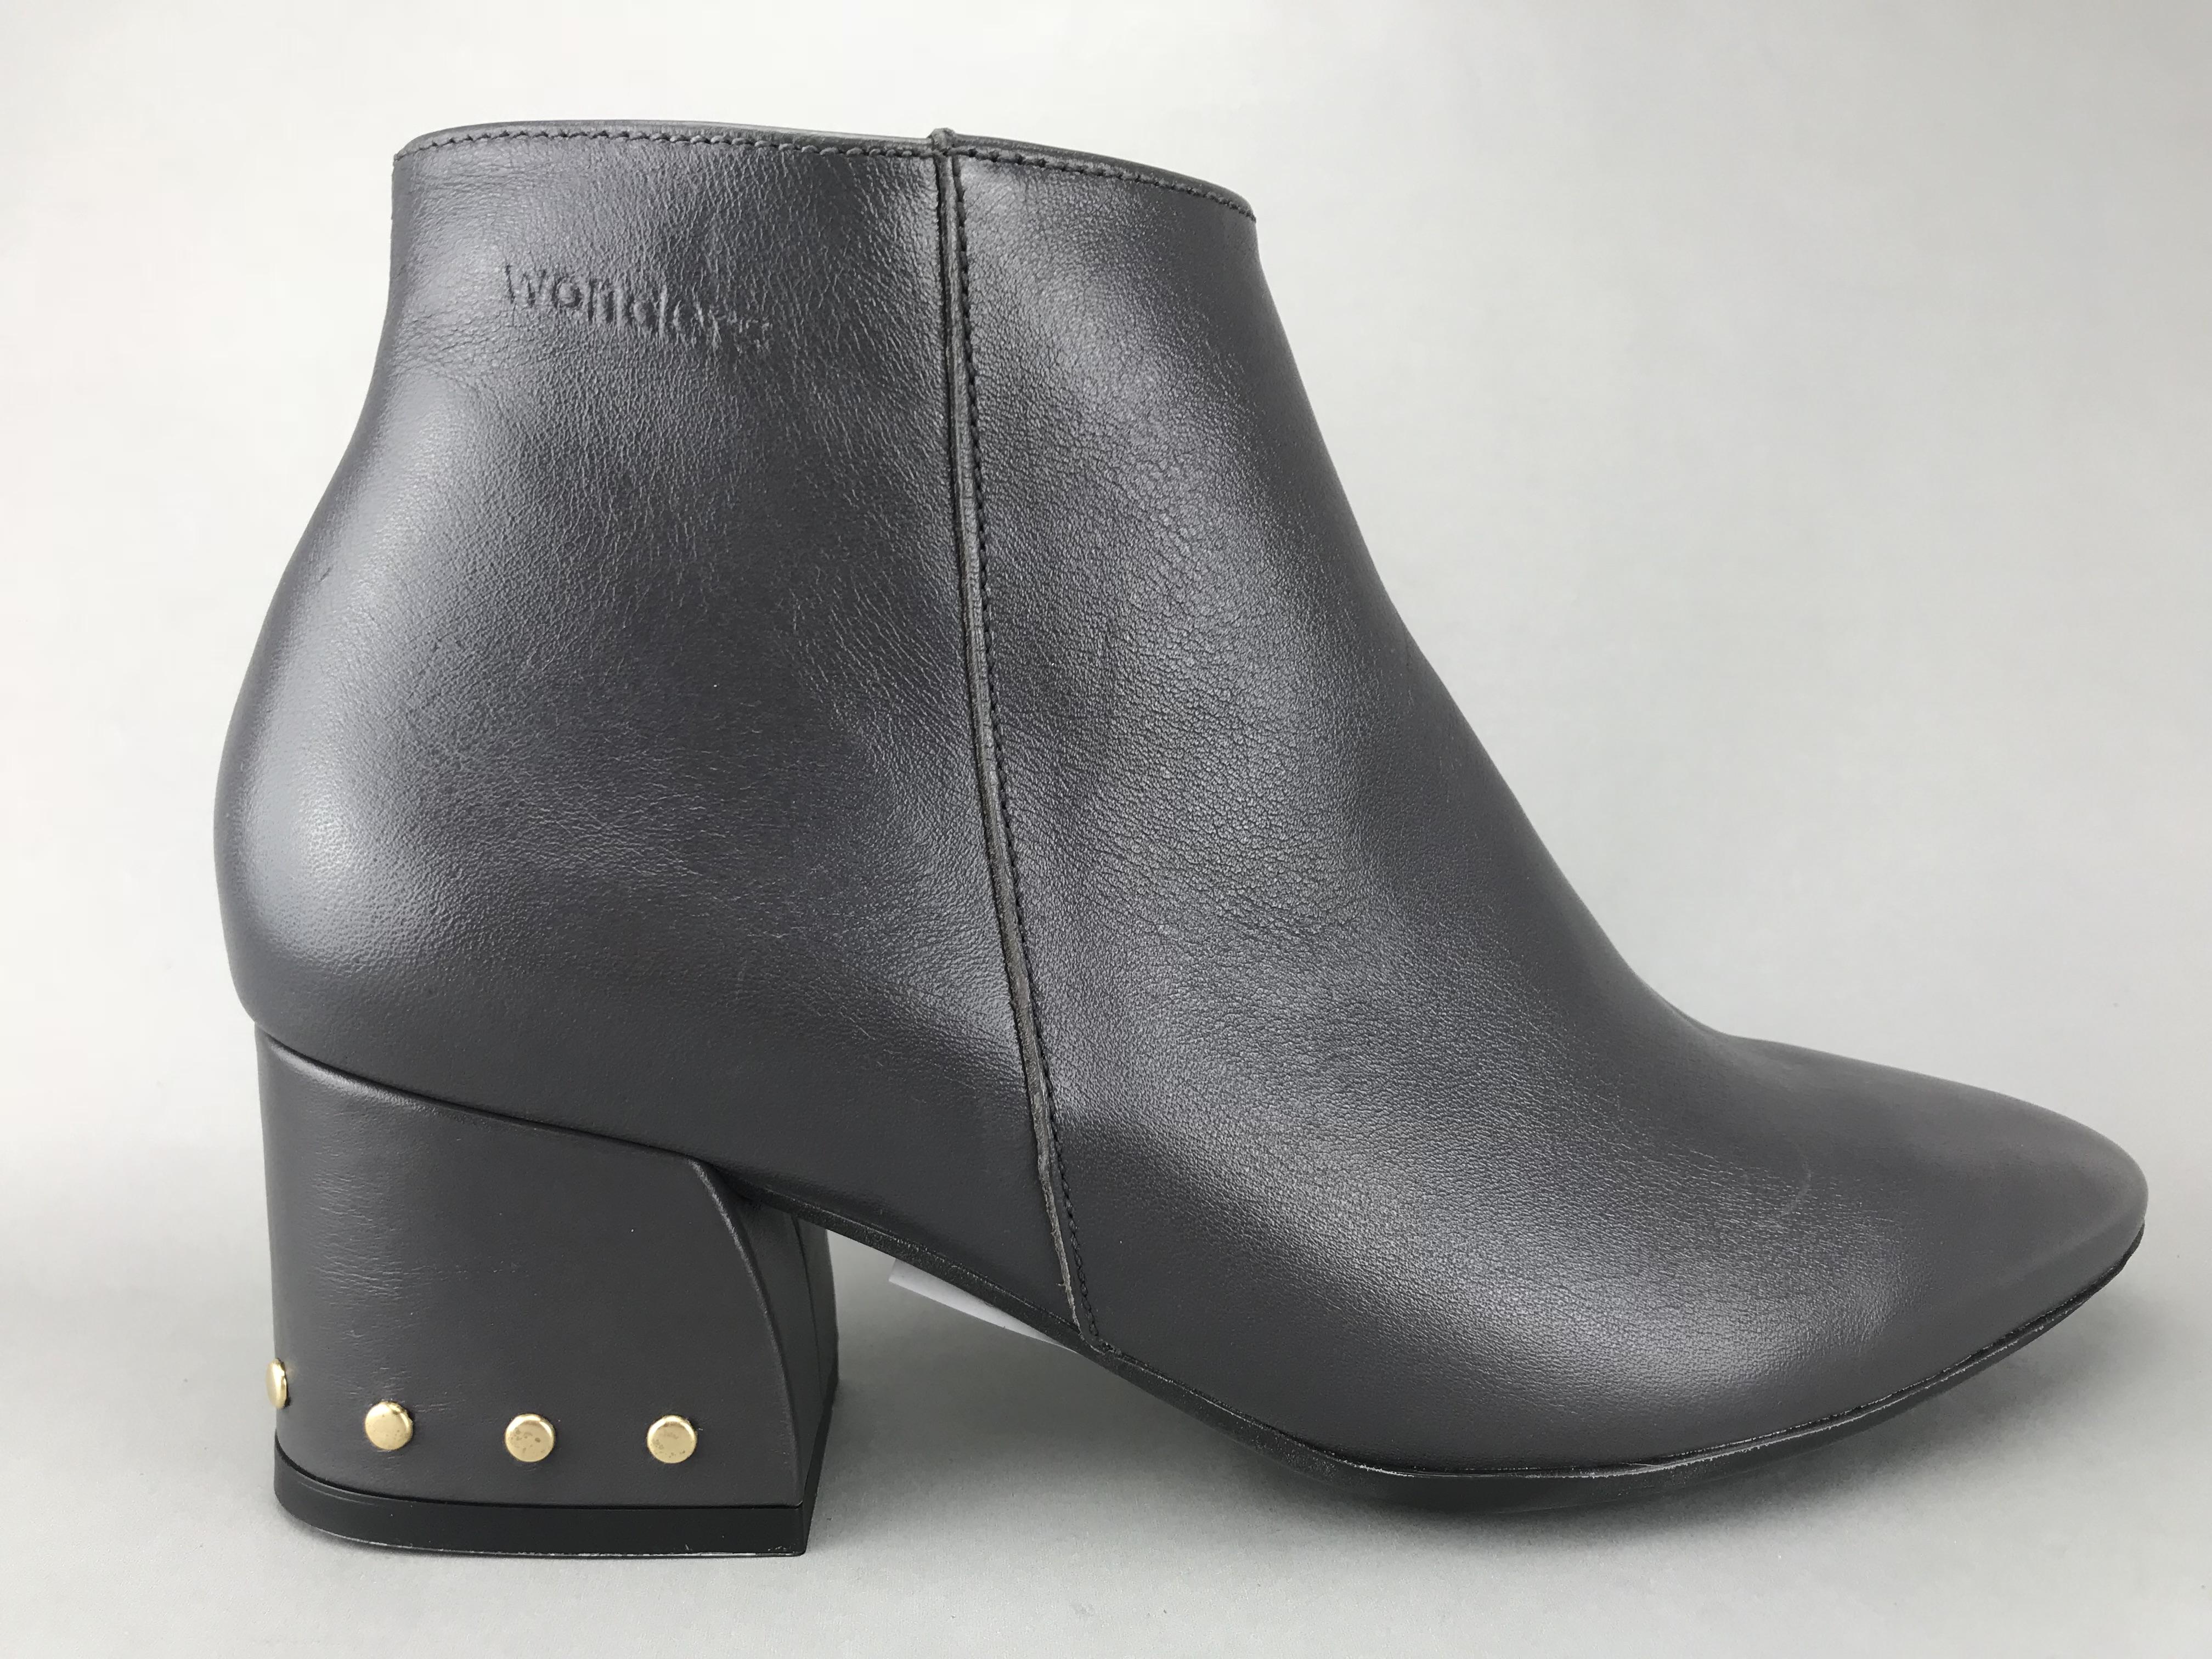 8e7b61b2b77 Wonders støvle m. nitter - grå - DAME - zjoos-hjoerring.dk